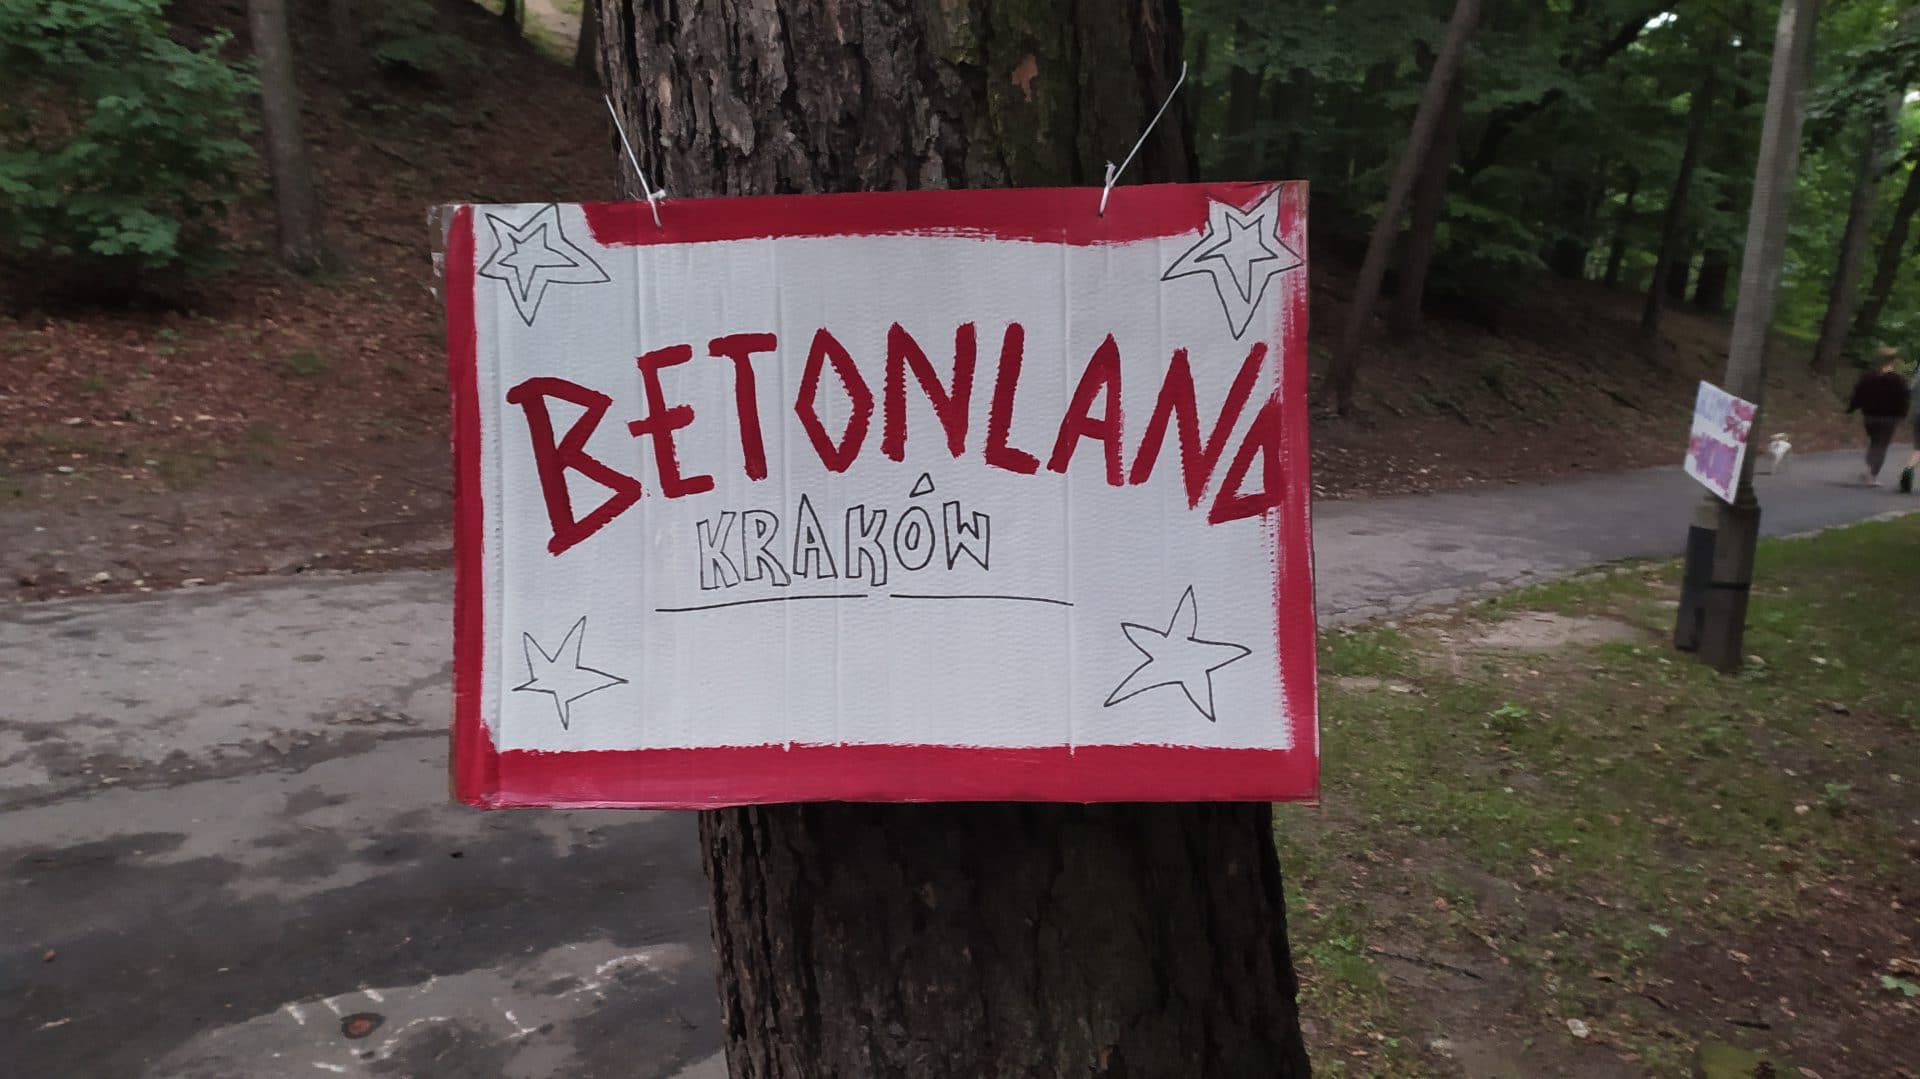 Betonland Kraków.